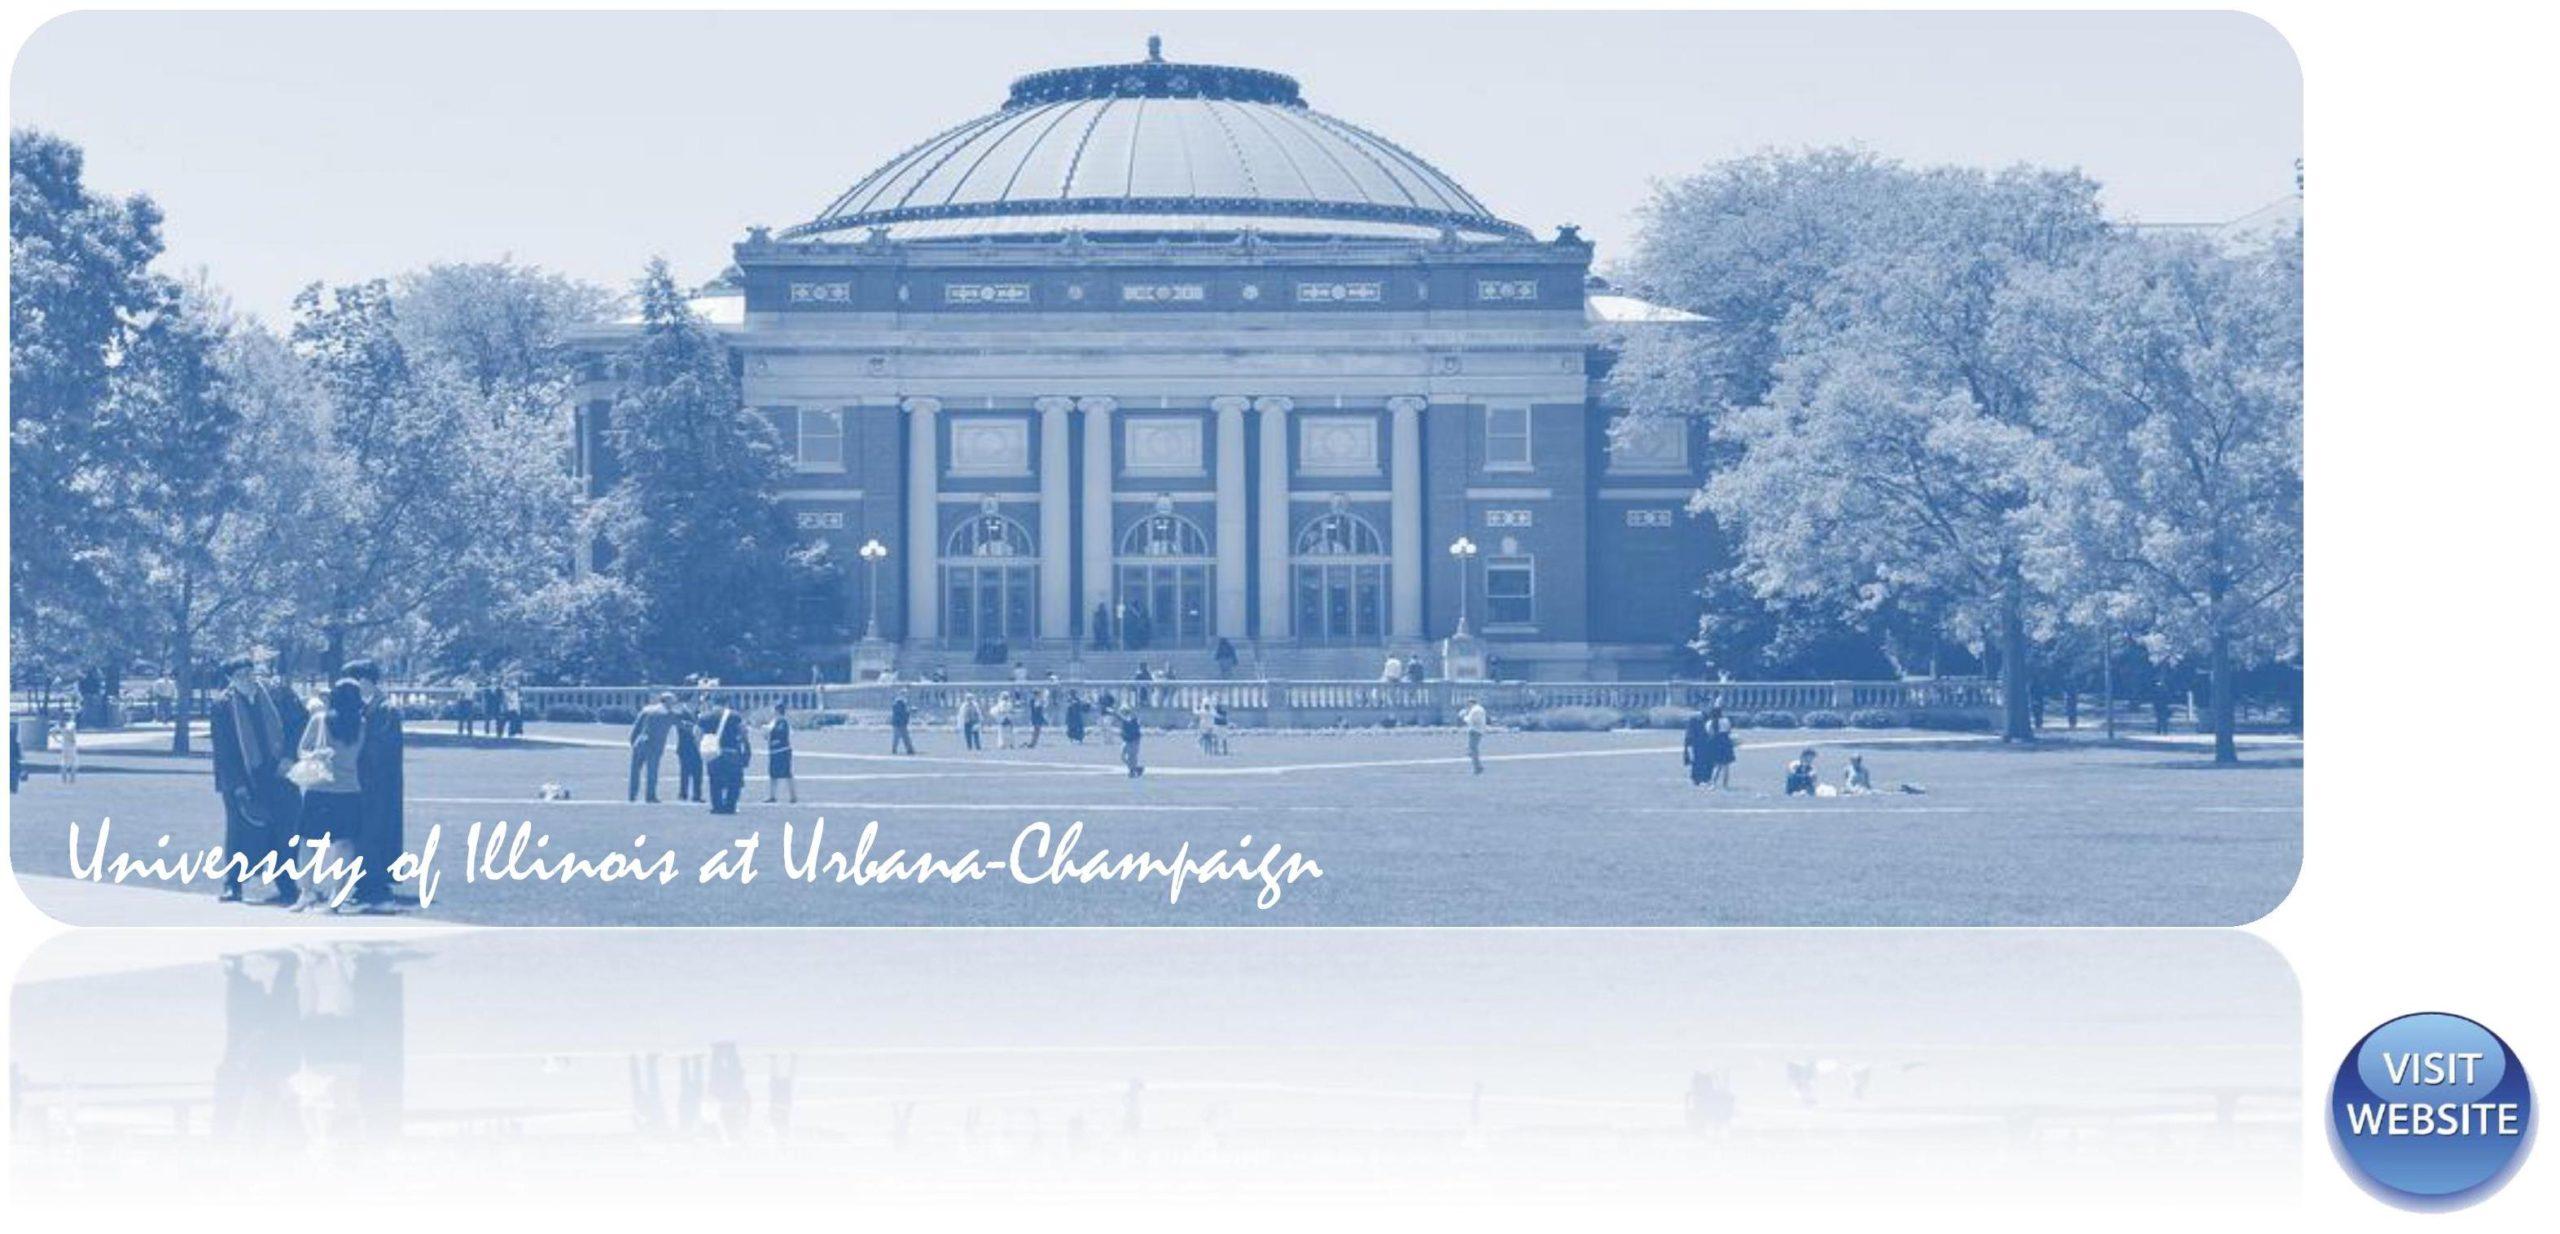 University of Illinois at Urbana-Champaign USA